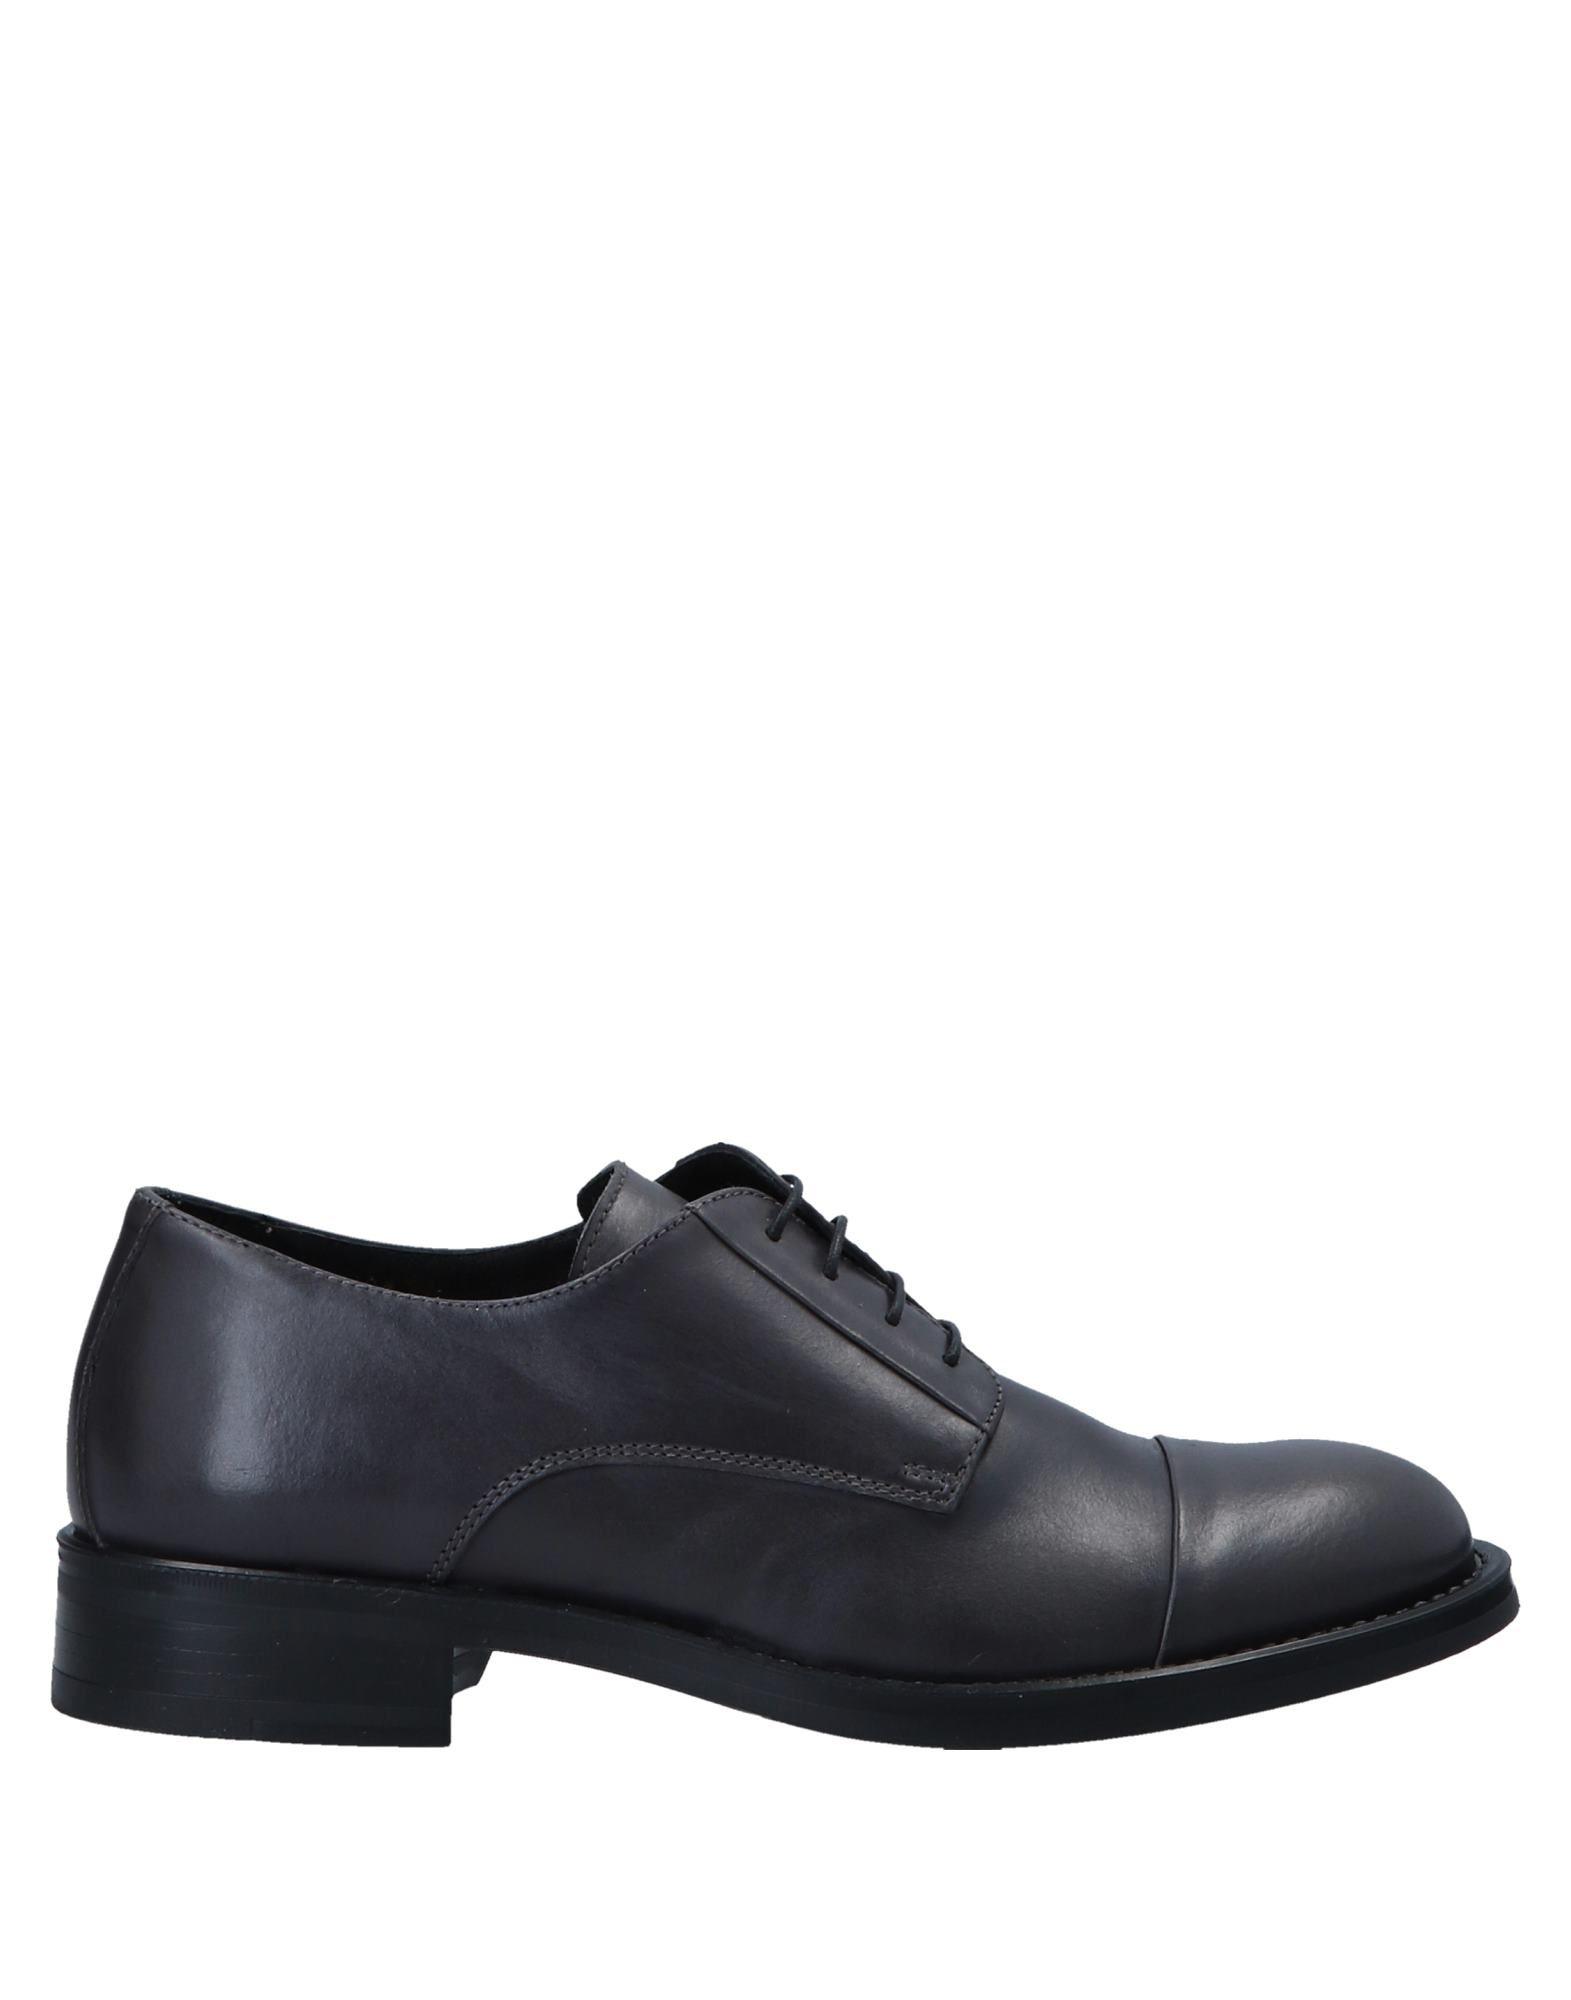 Gianfranco Lattanzi Schnürschuhe Damen  11547181QLGut aussehende strapazierfähige Schuhe